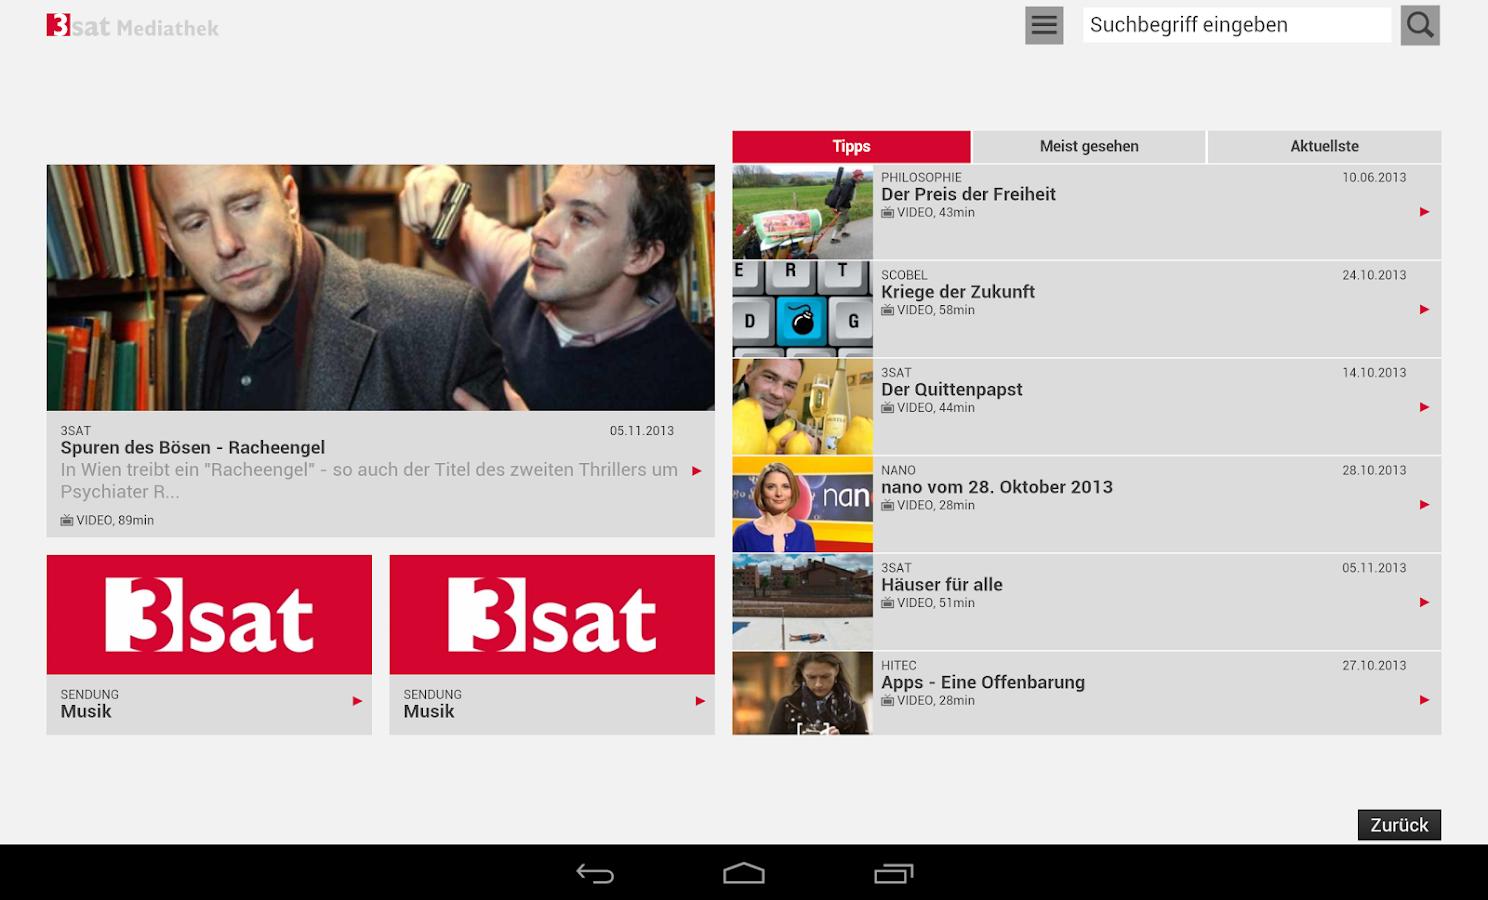 3sat Mediathek Spielfilm